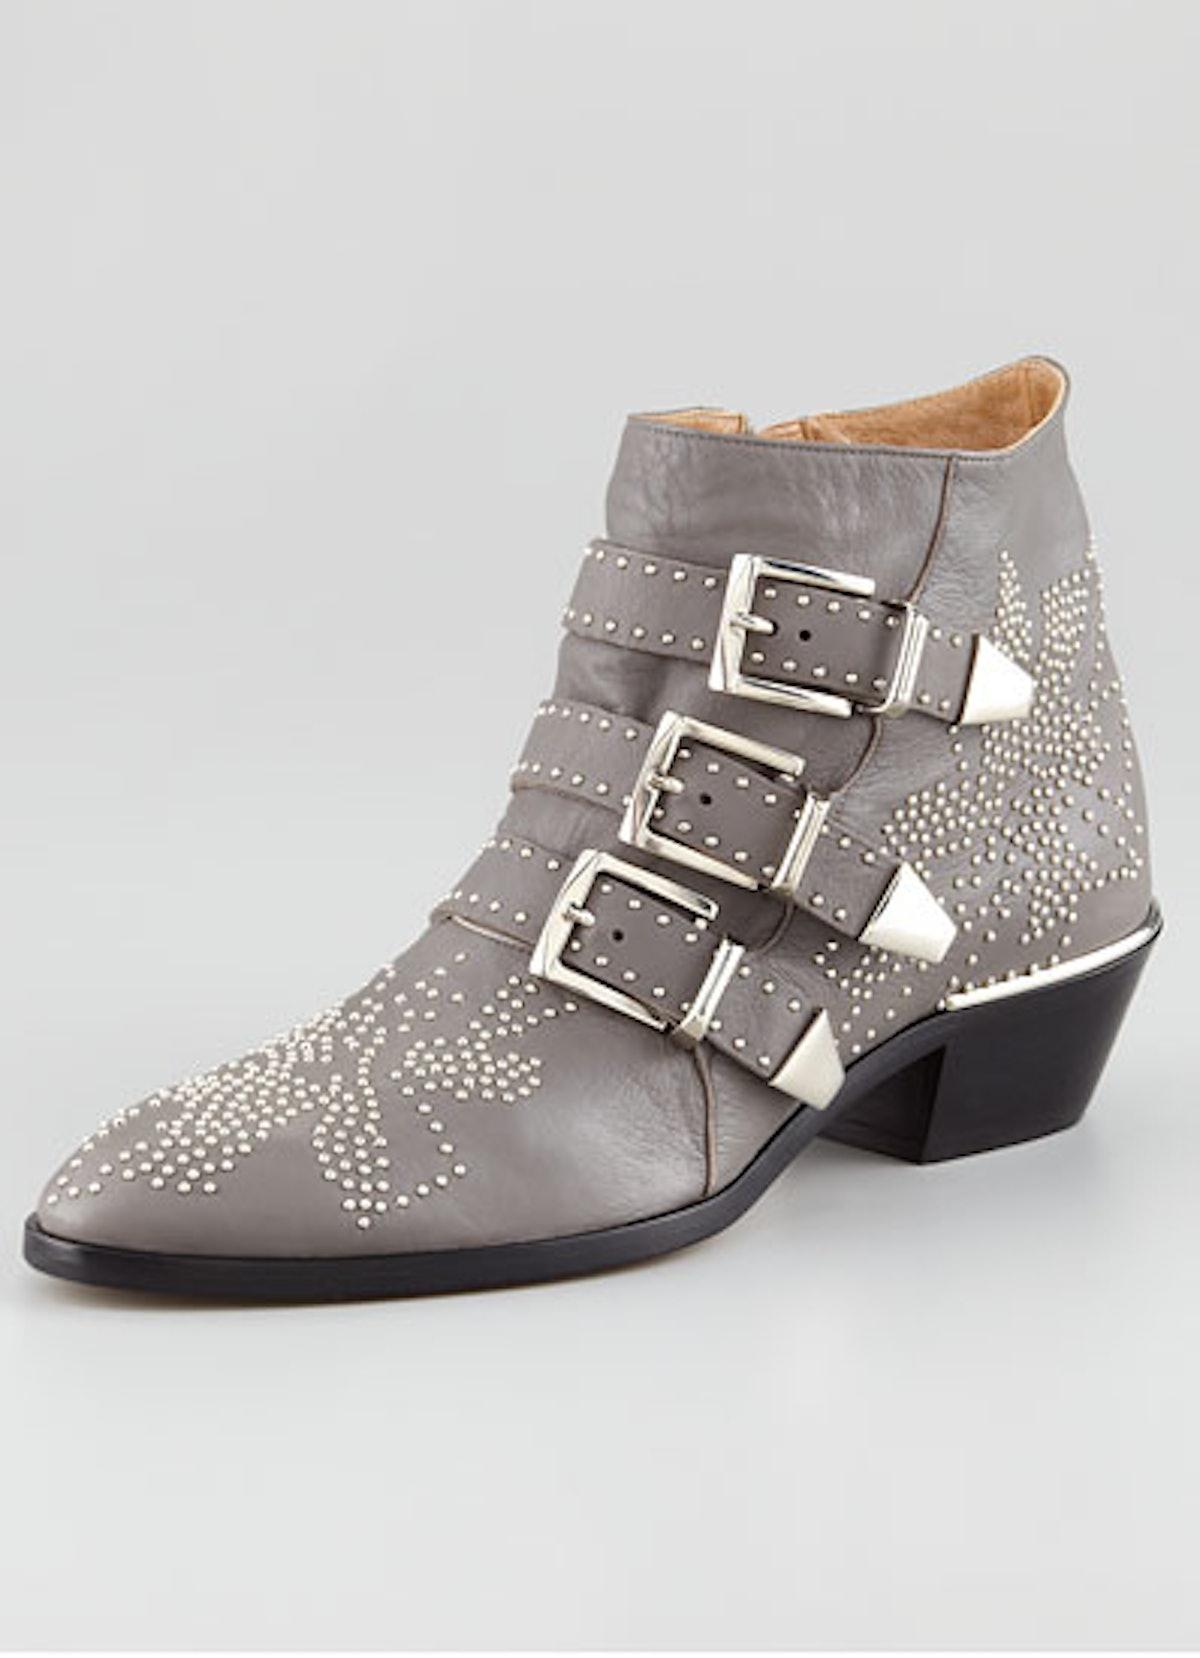 fass-flat-boot-trend-03-v.jpg